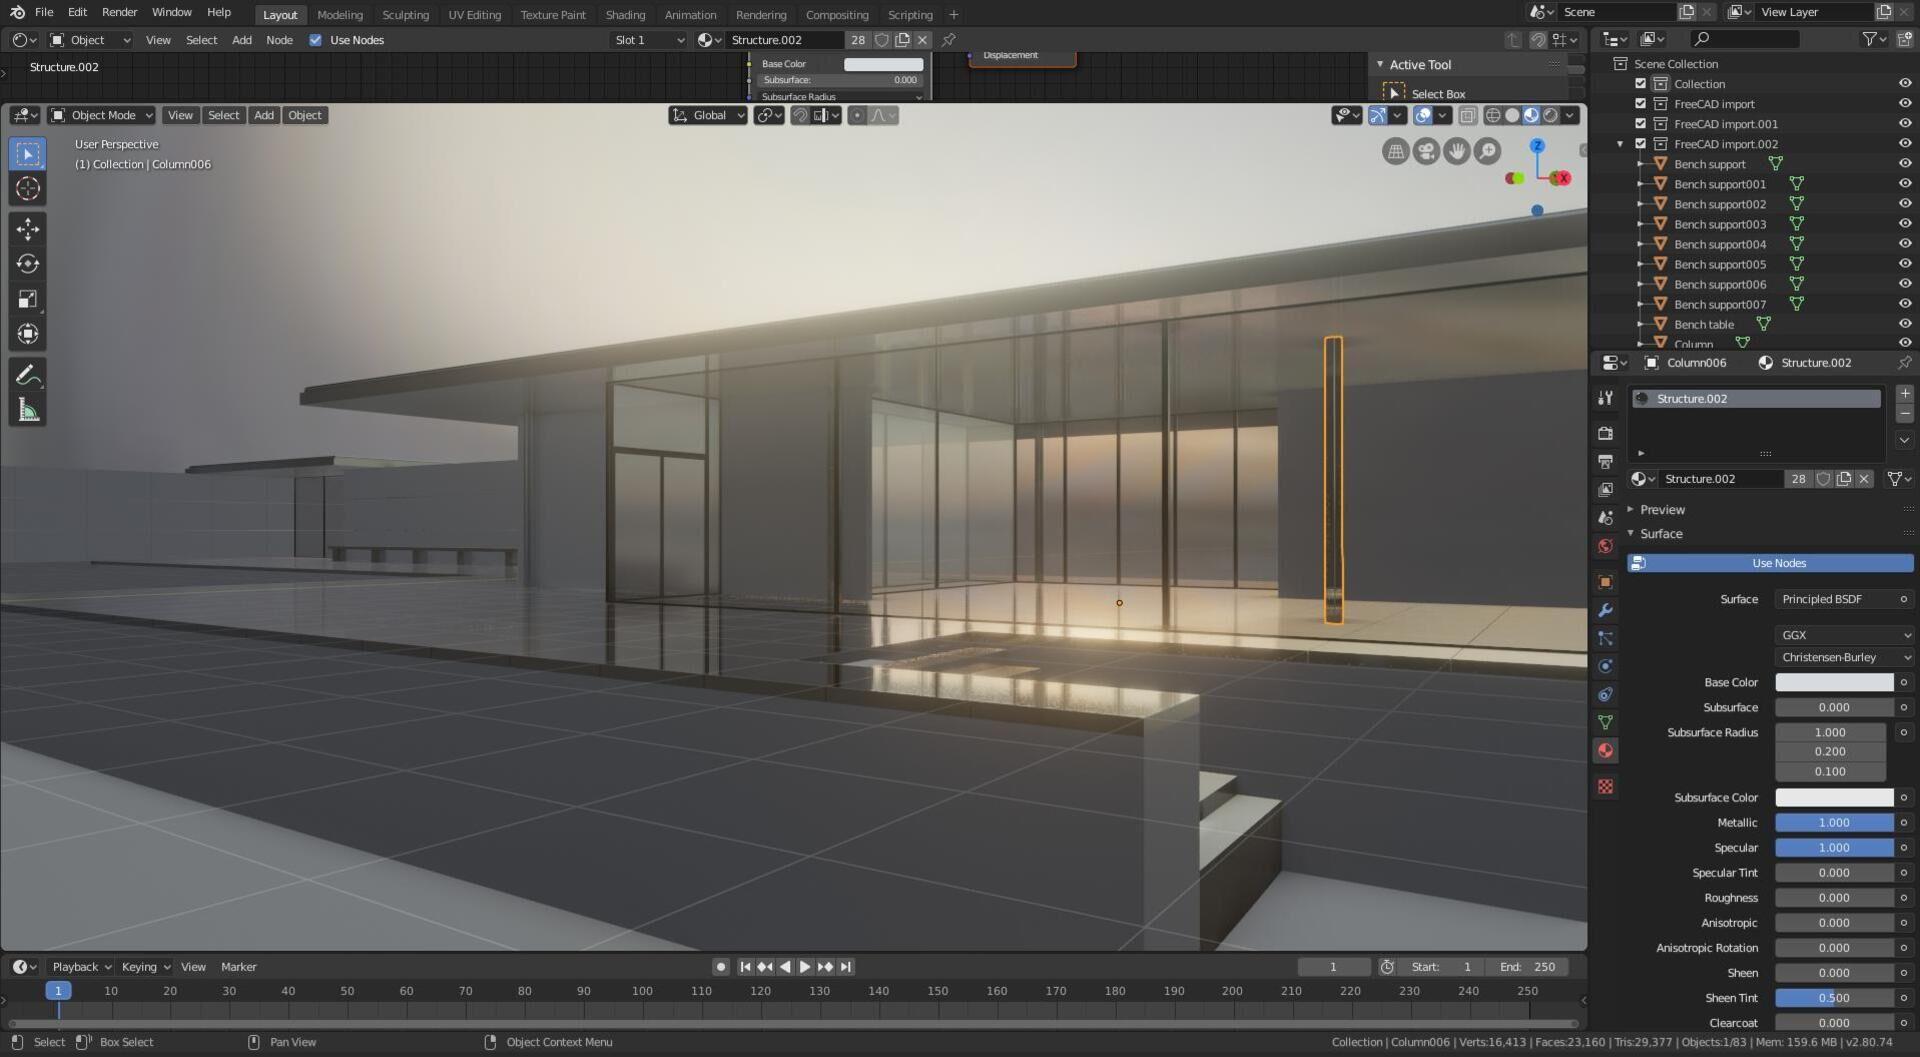 Blender's 3D view